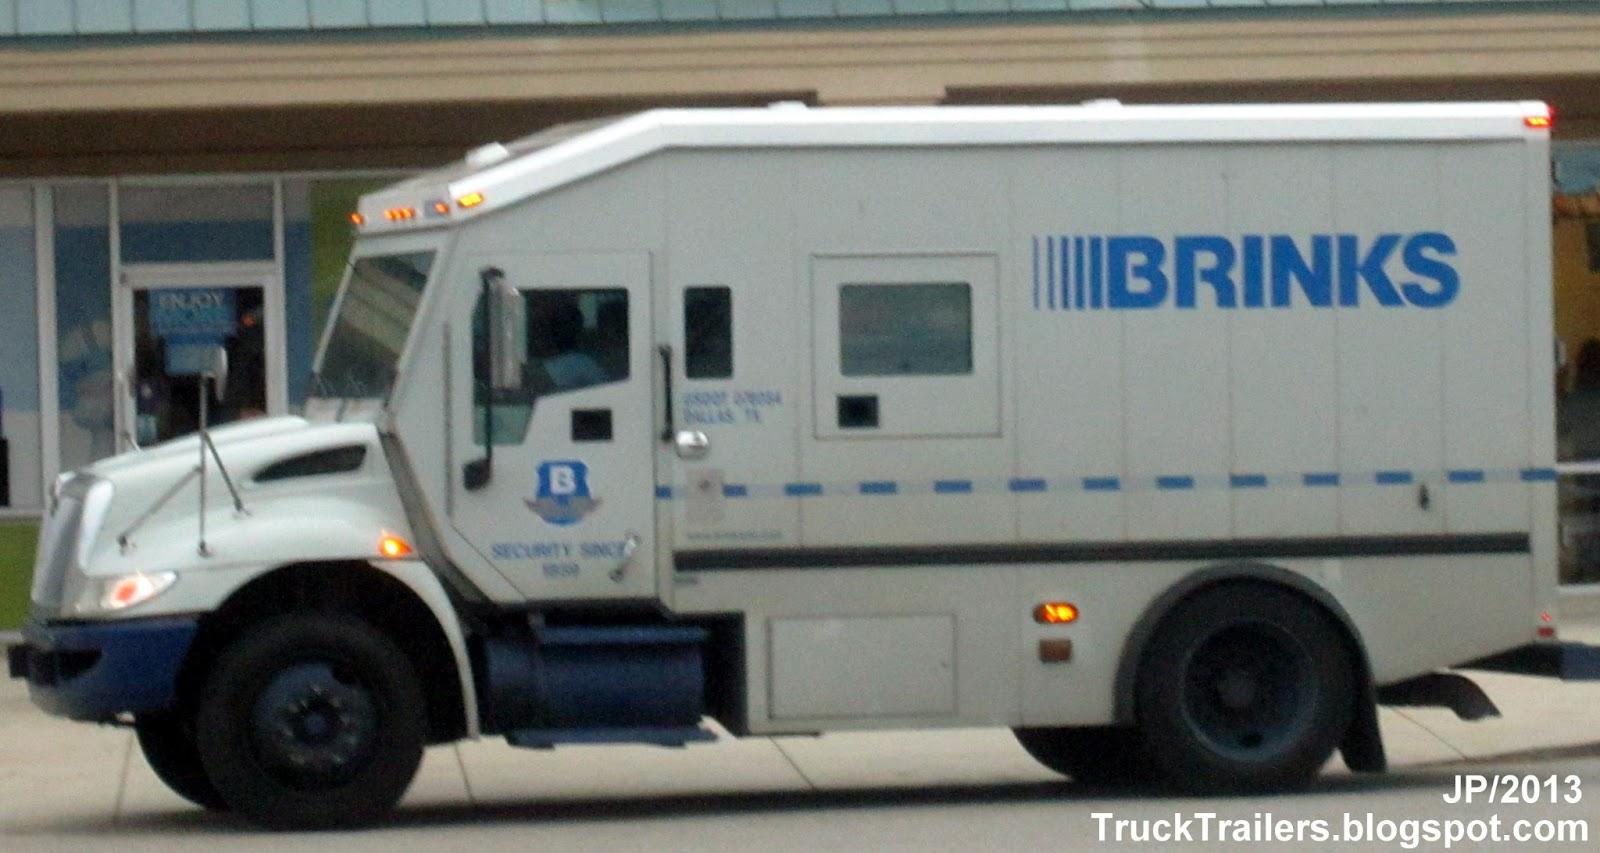 Brinks inc armored car albany georgia brinks international armored truck money transfer service vehicle brinks international truck armored car transport